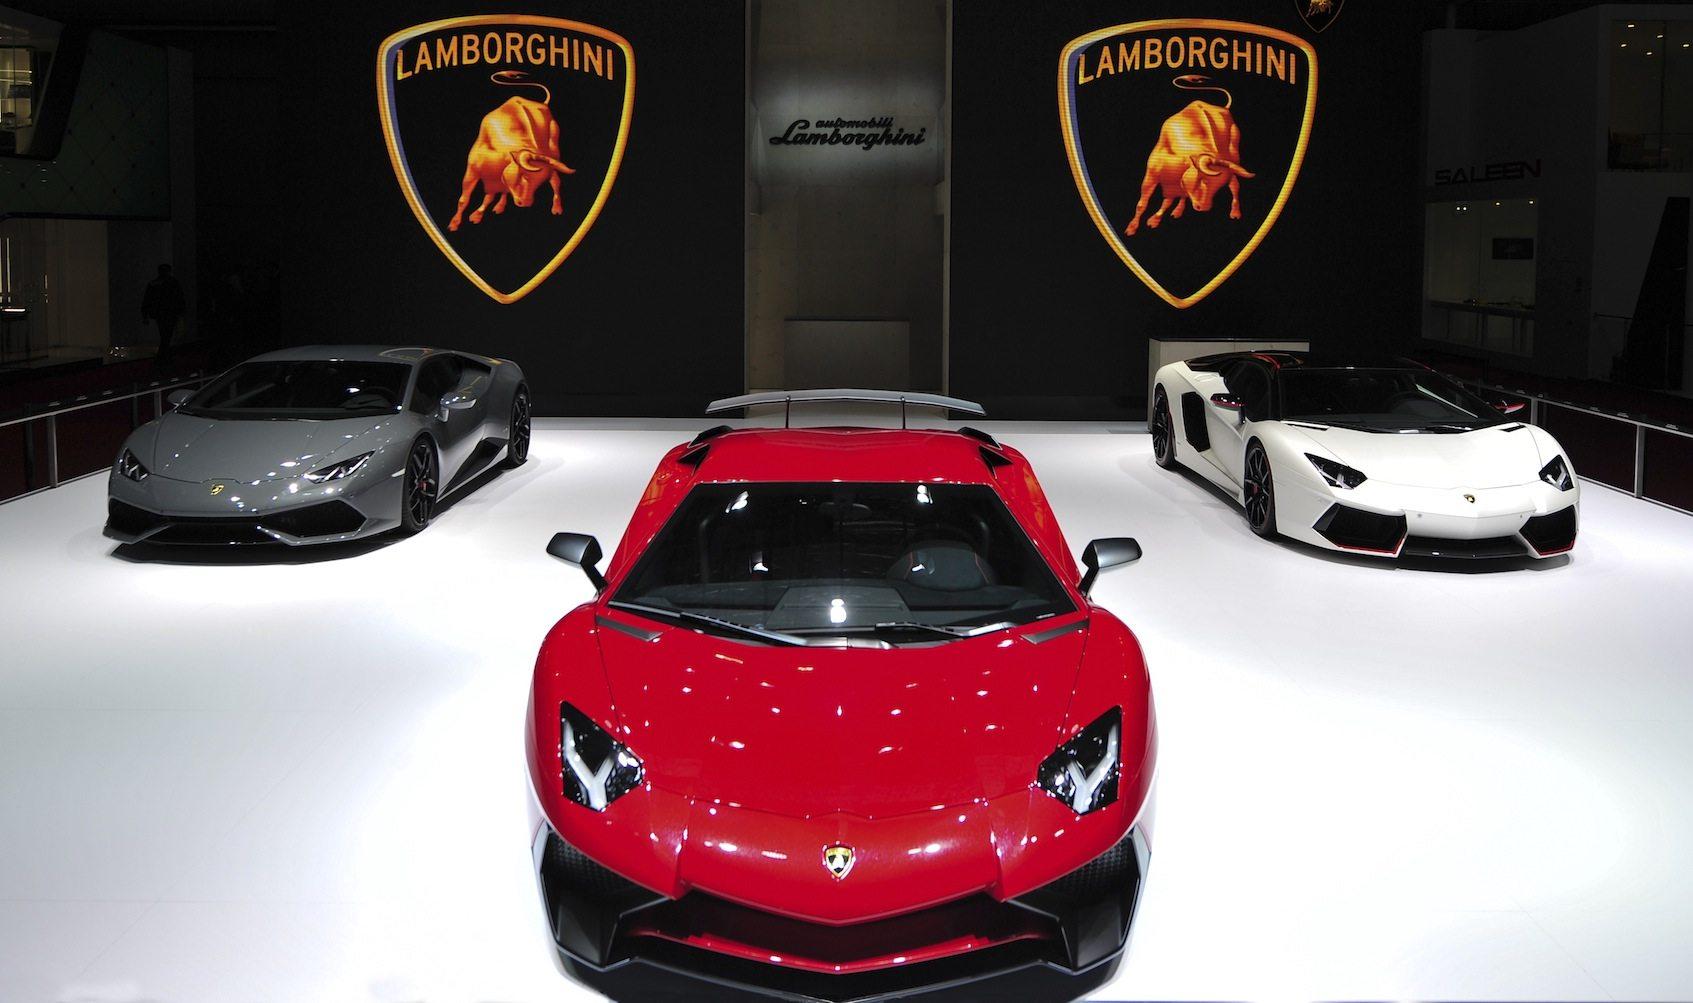 lamborghini-presents-the-new-aventador-lp-750-4-superveloce-at-auto-shanghai-2015-378405